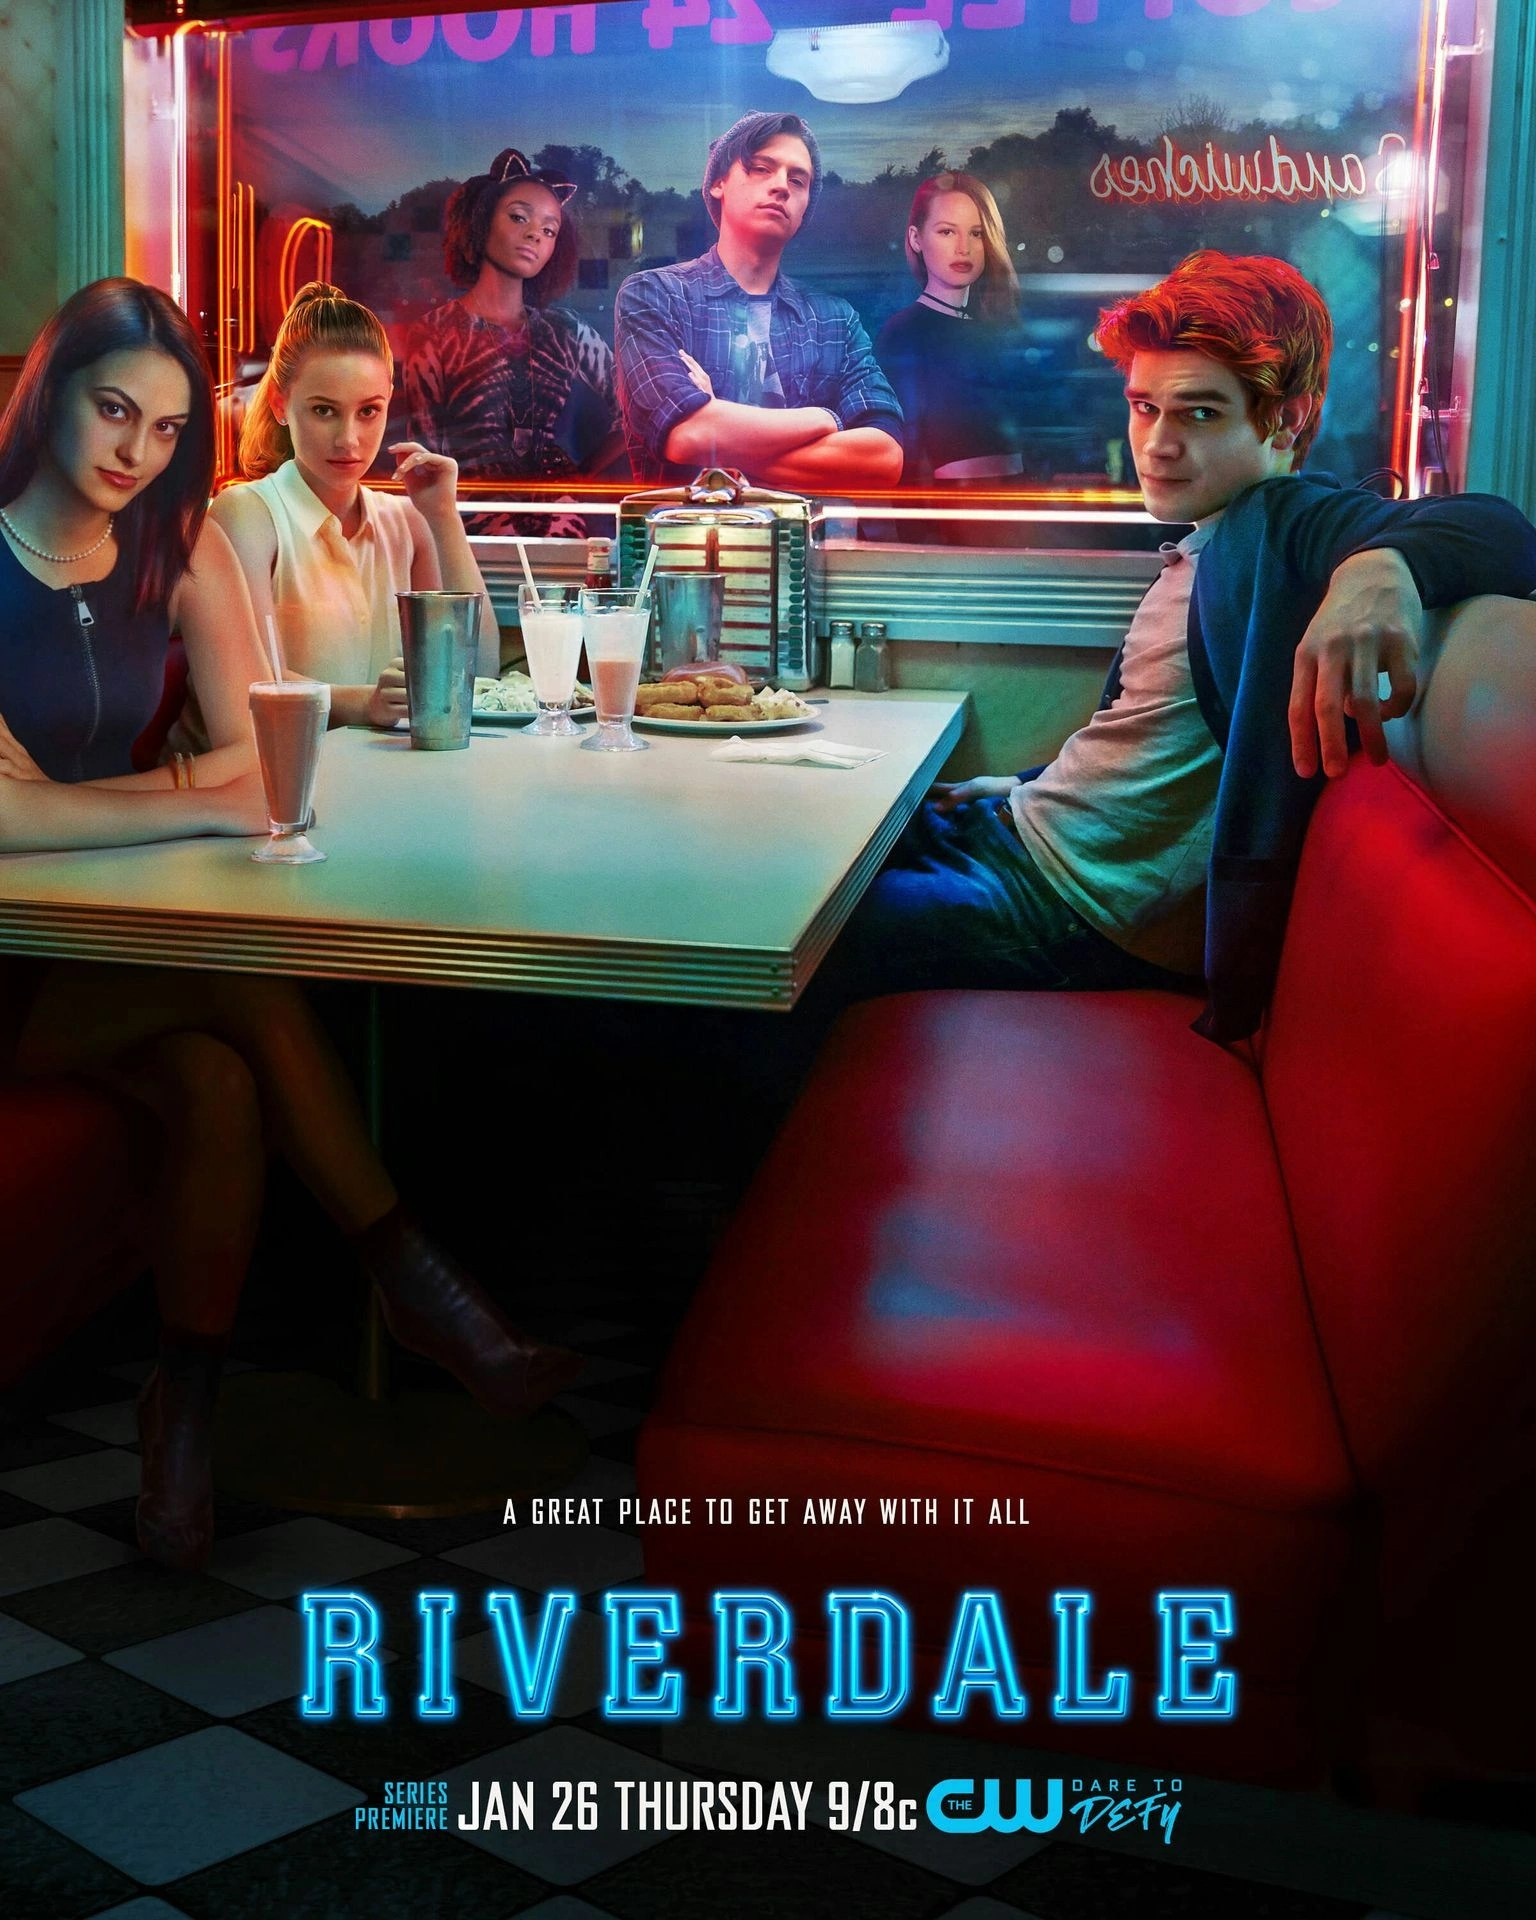 Riverdale Saison 3 Episode 1 Streaming : riverdale, saison, episode, streaming, Download, Riverdale, Season, Fasrima